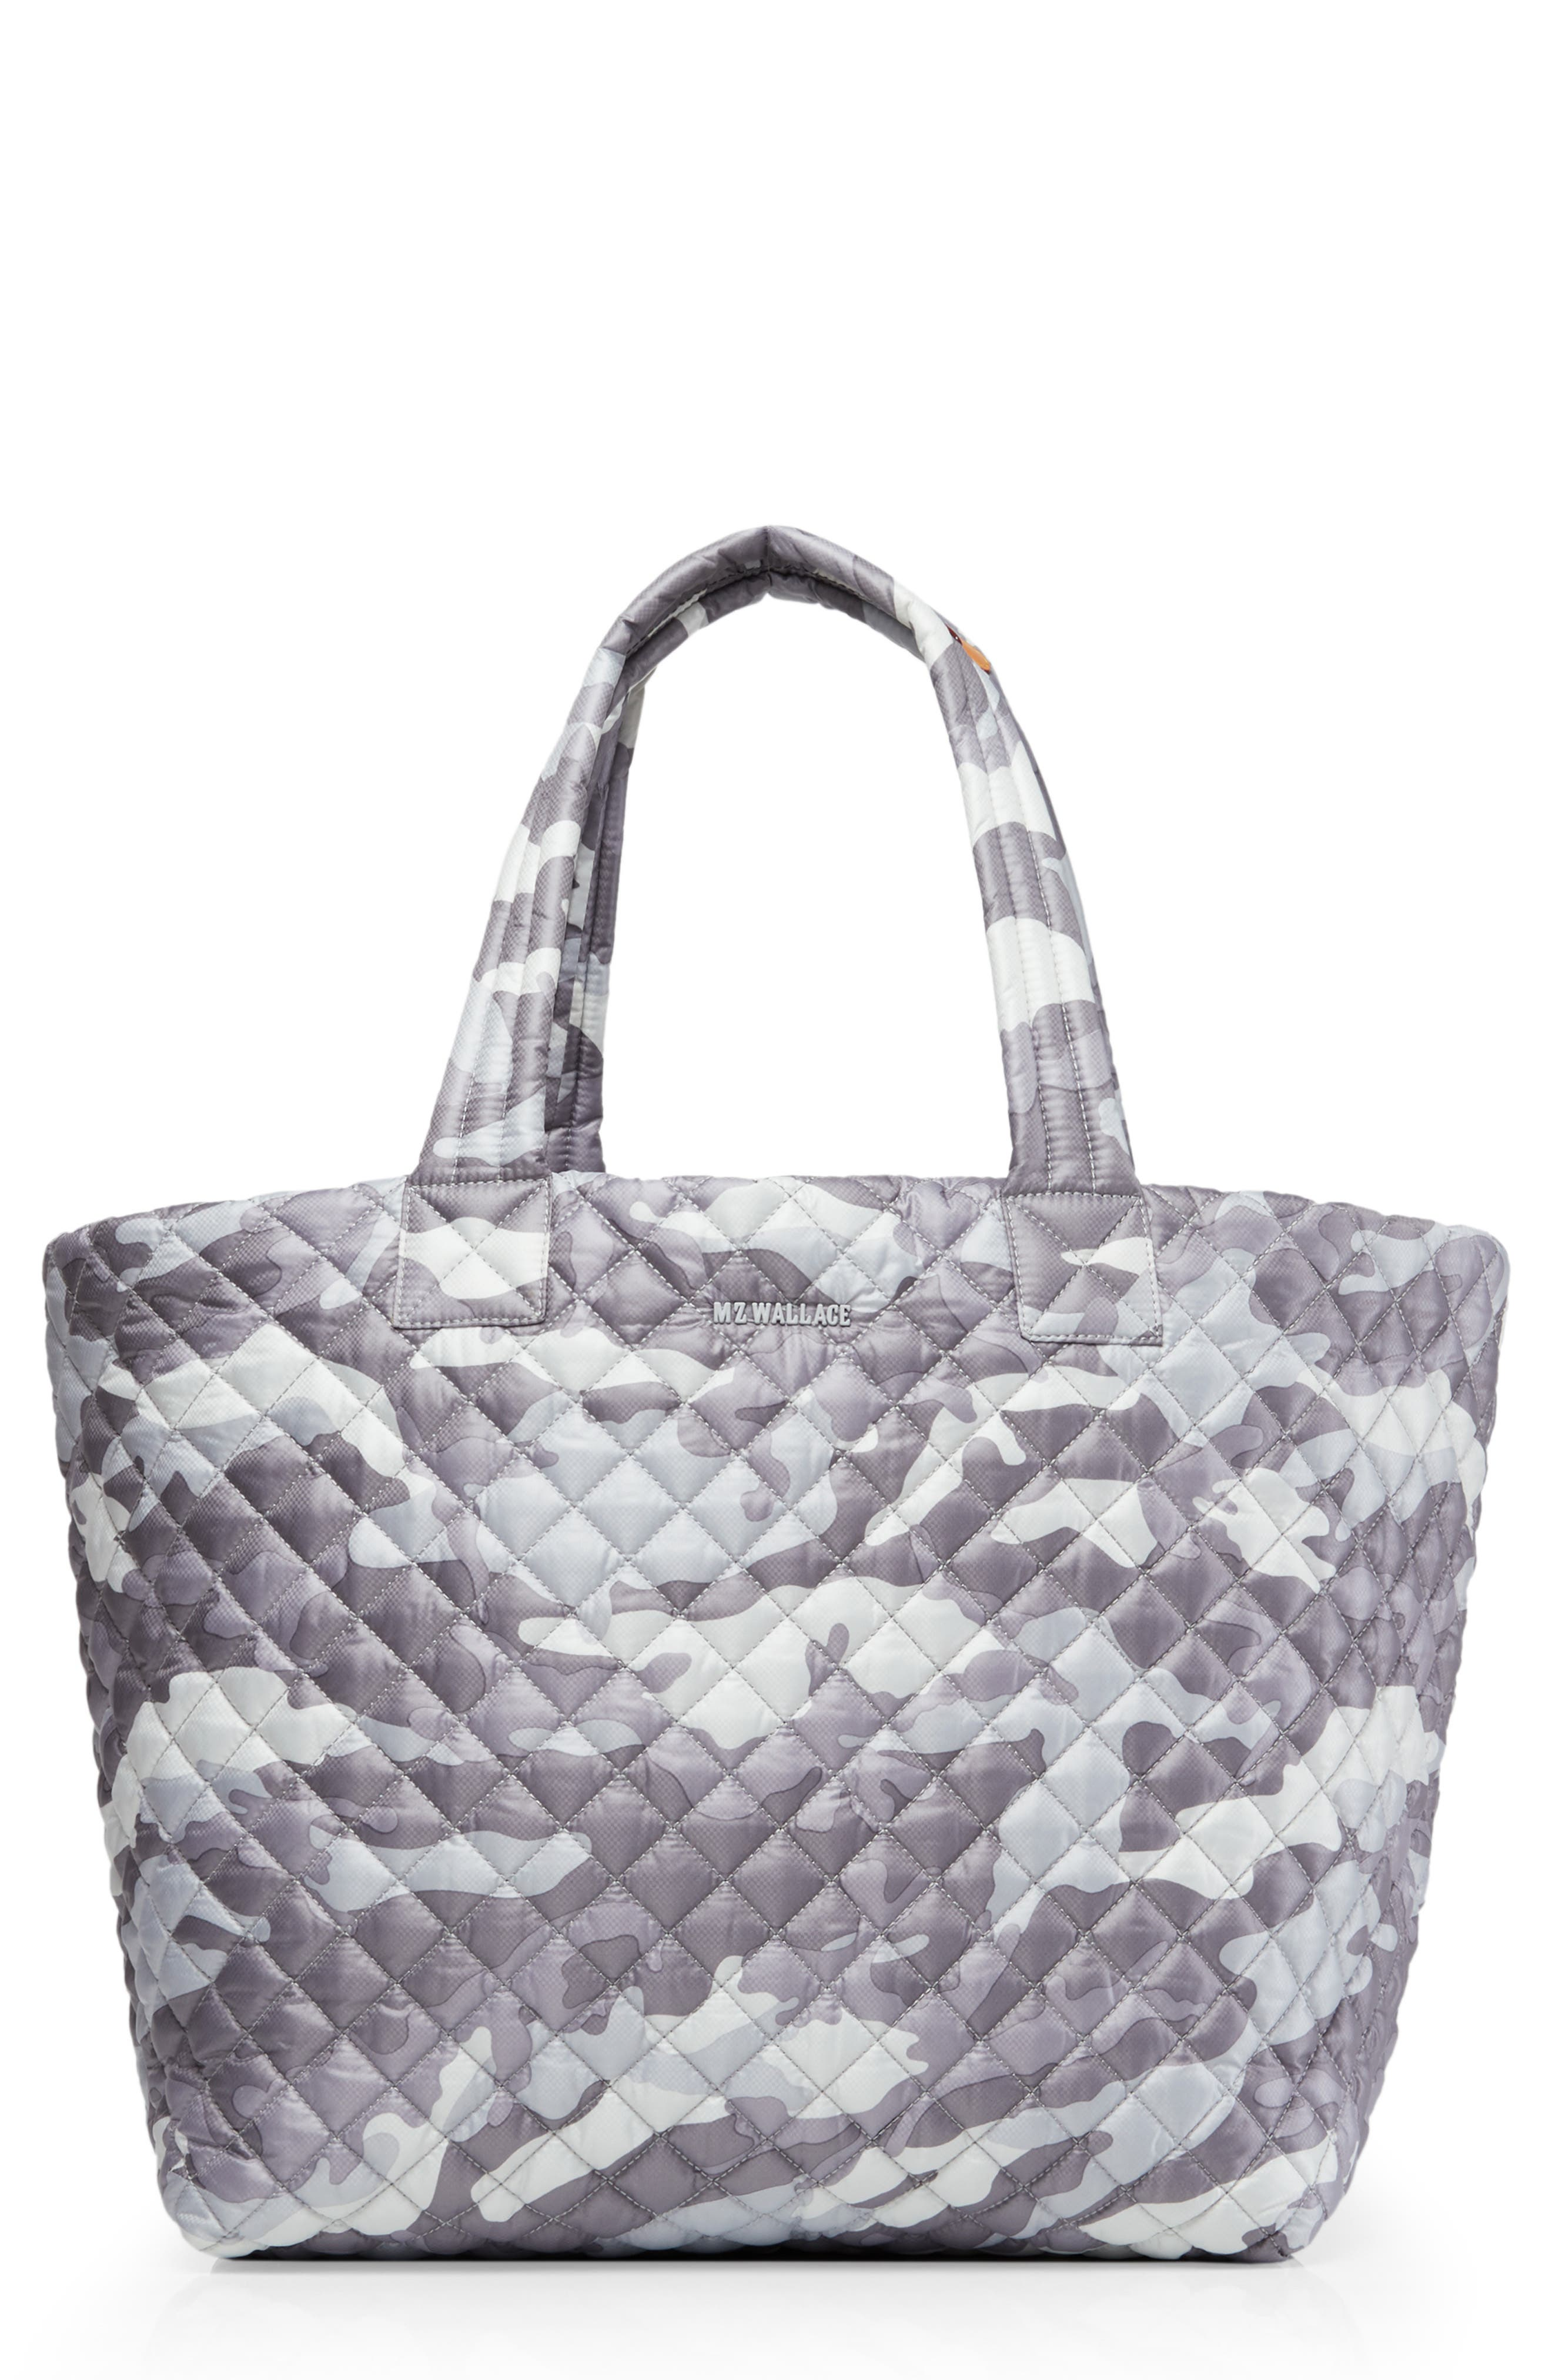 817caf6b81f0 Handbags & Purses | Nordstrom